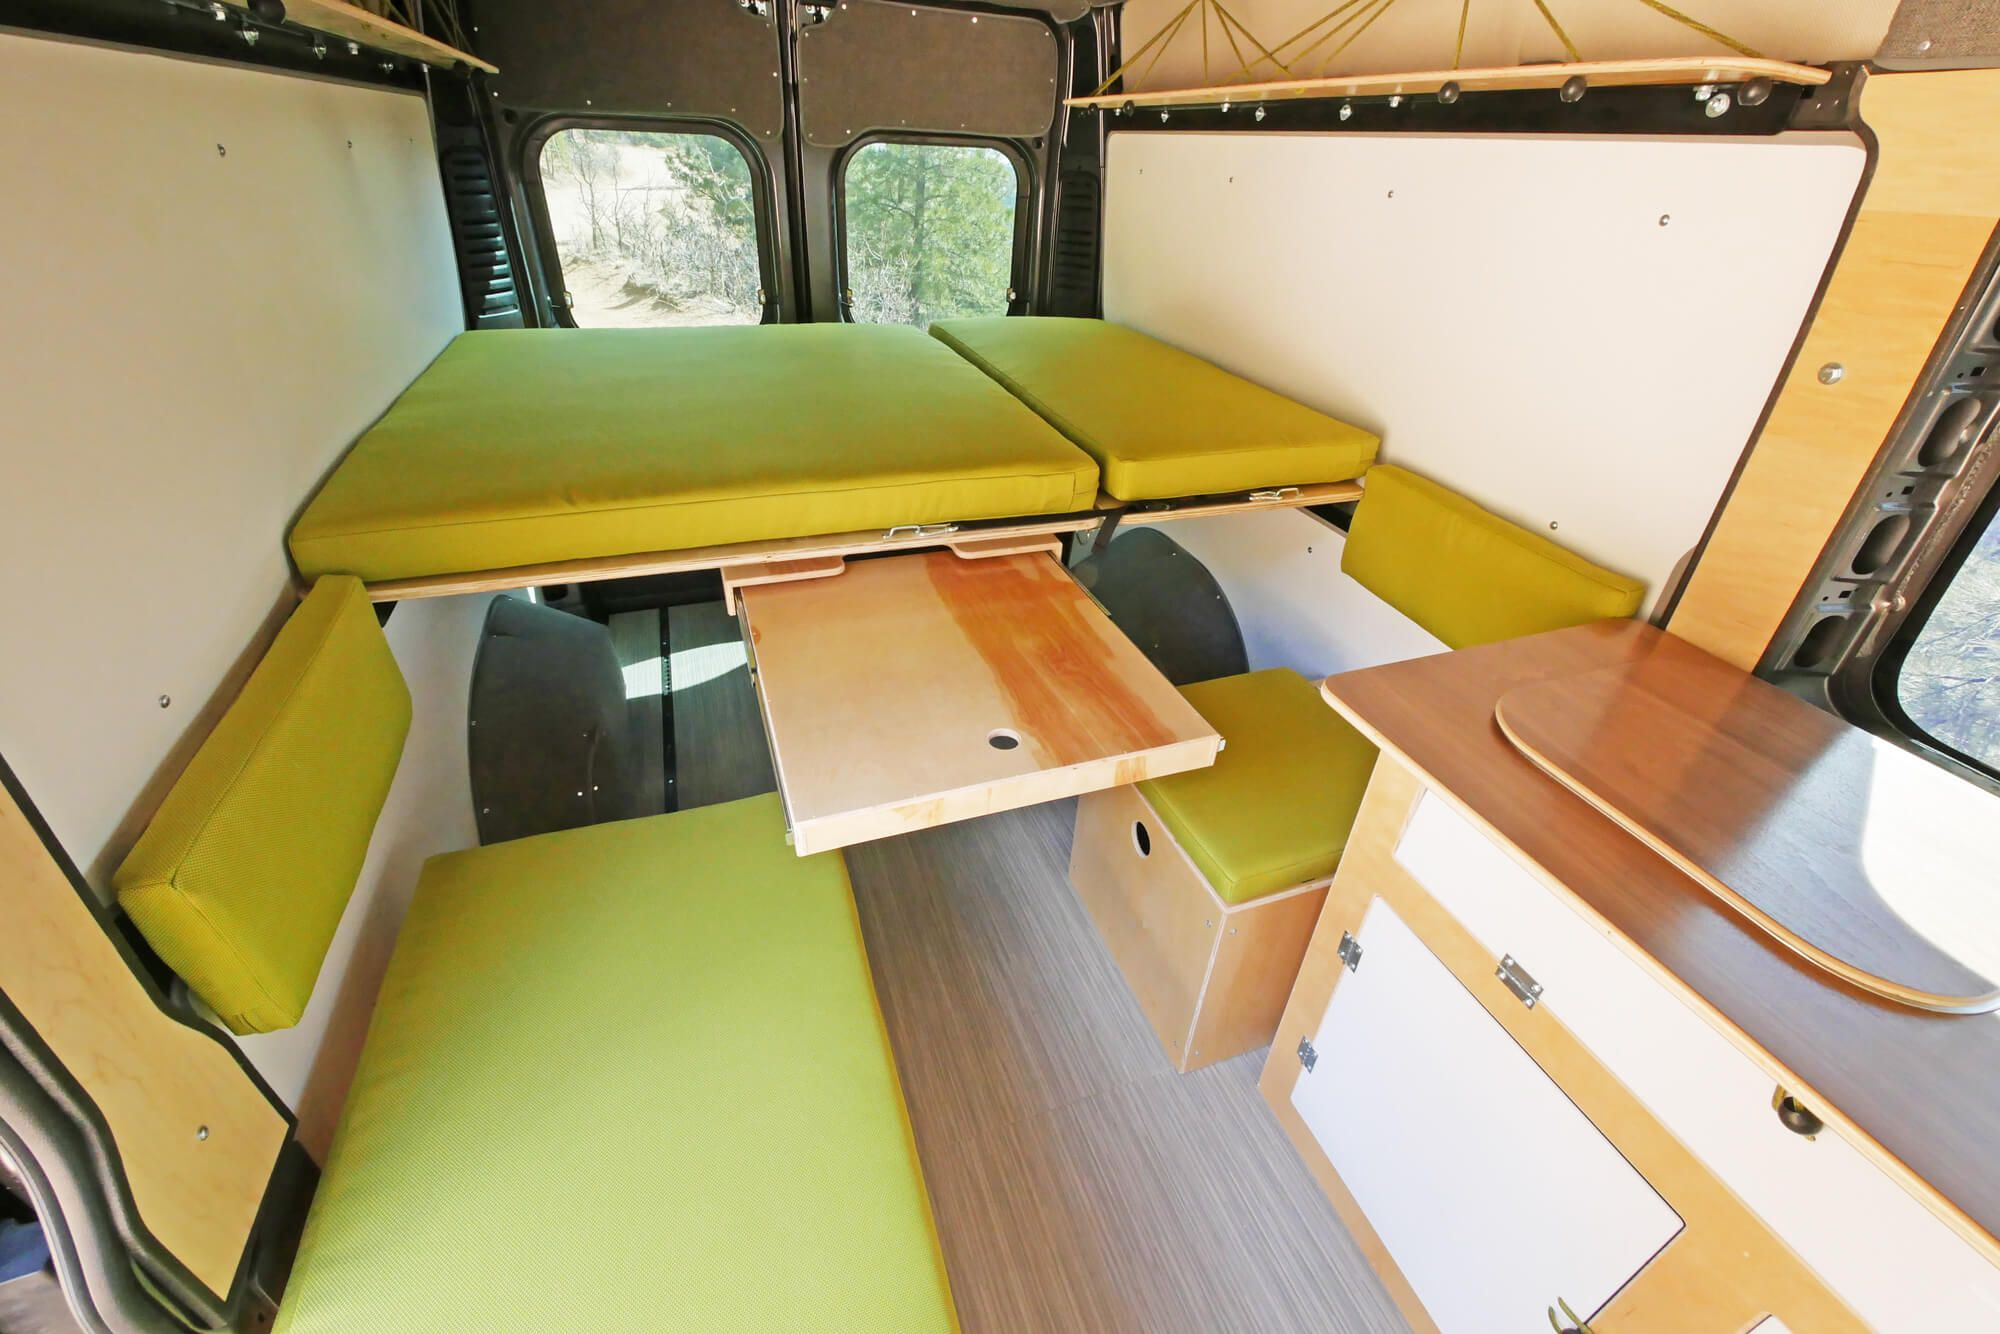 Walt Camper Van Conversion Kit For Ram Promaster 1500 Or 2500 159 Van Conversion Kits Van Conversion Camper Van Conversion